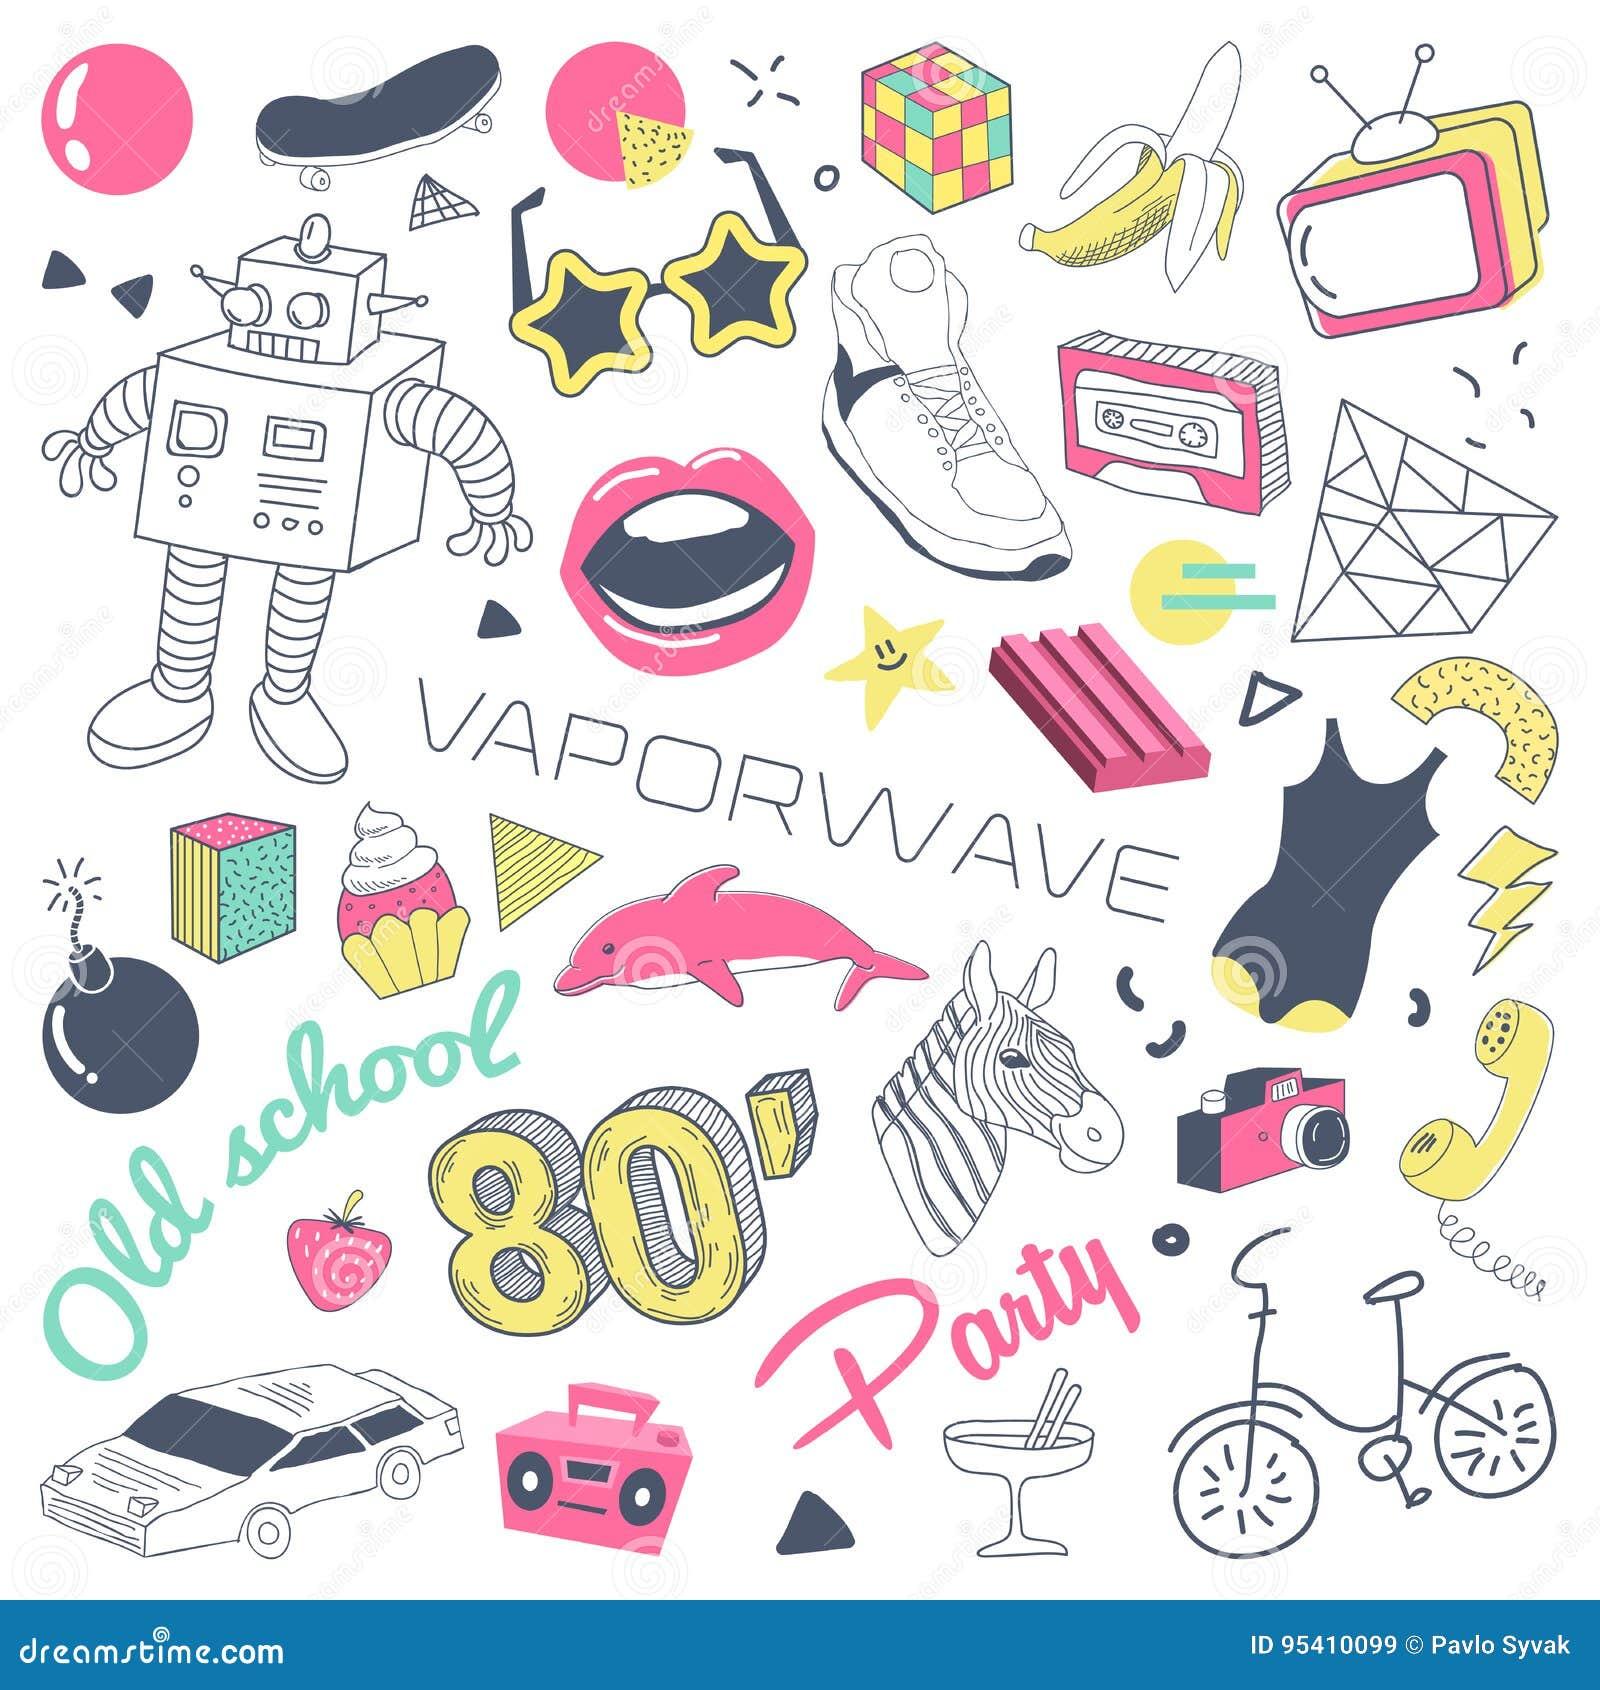 d6f69c8fa1c Doodle Sunglasses Stock Illustrations – 5